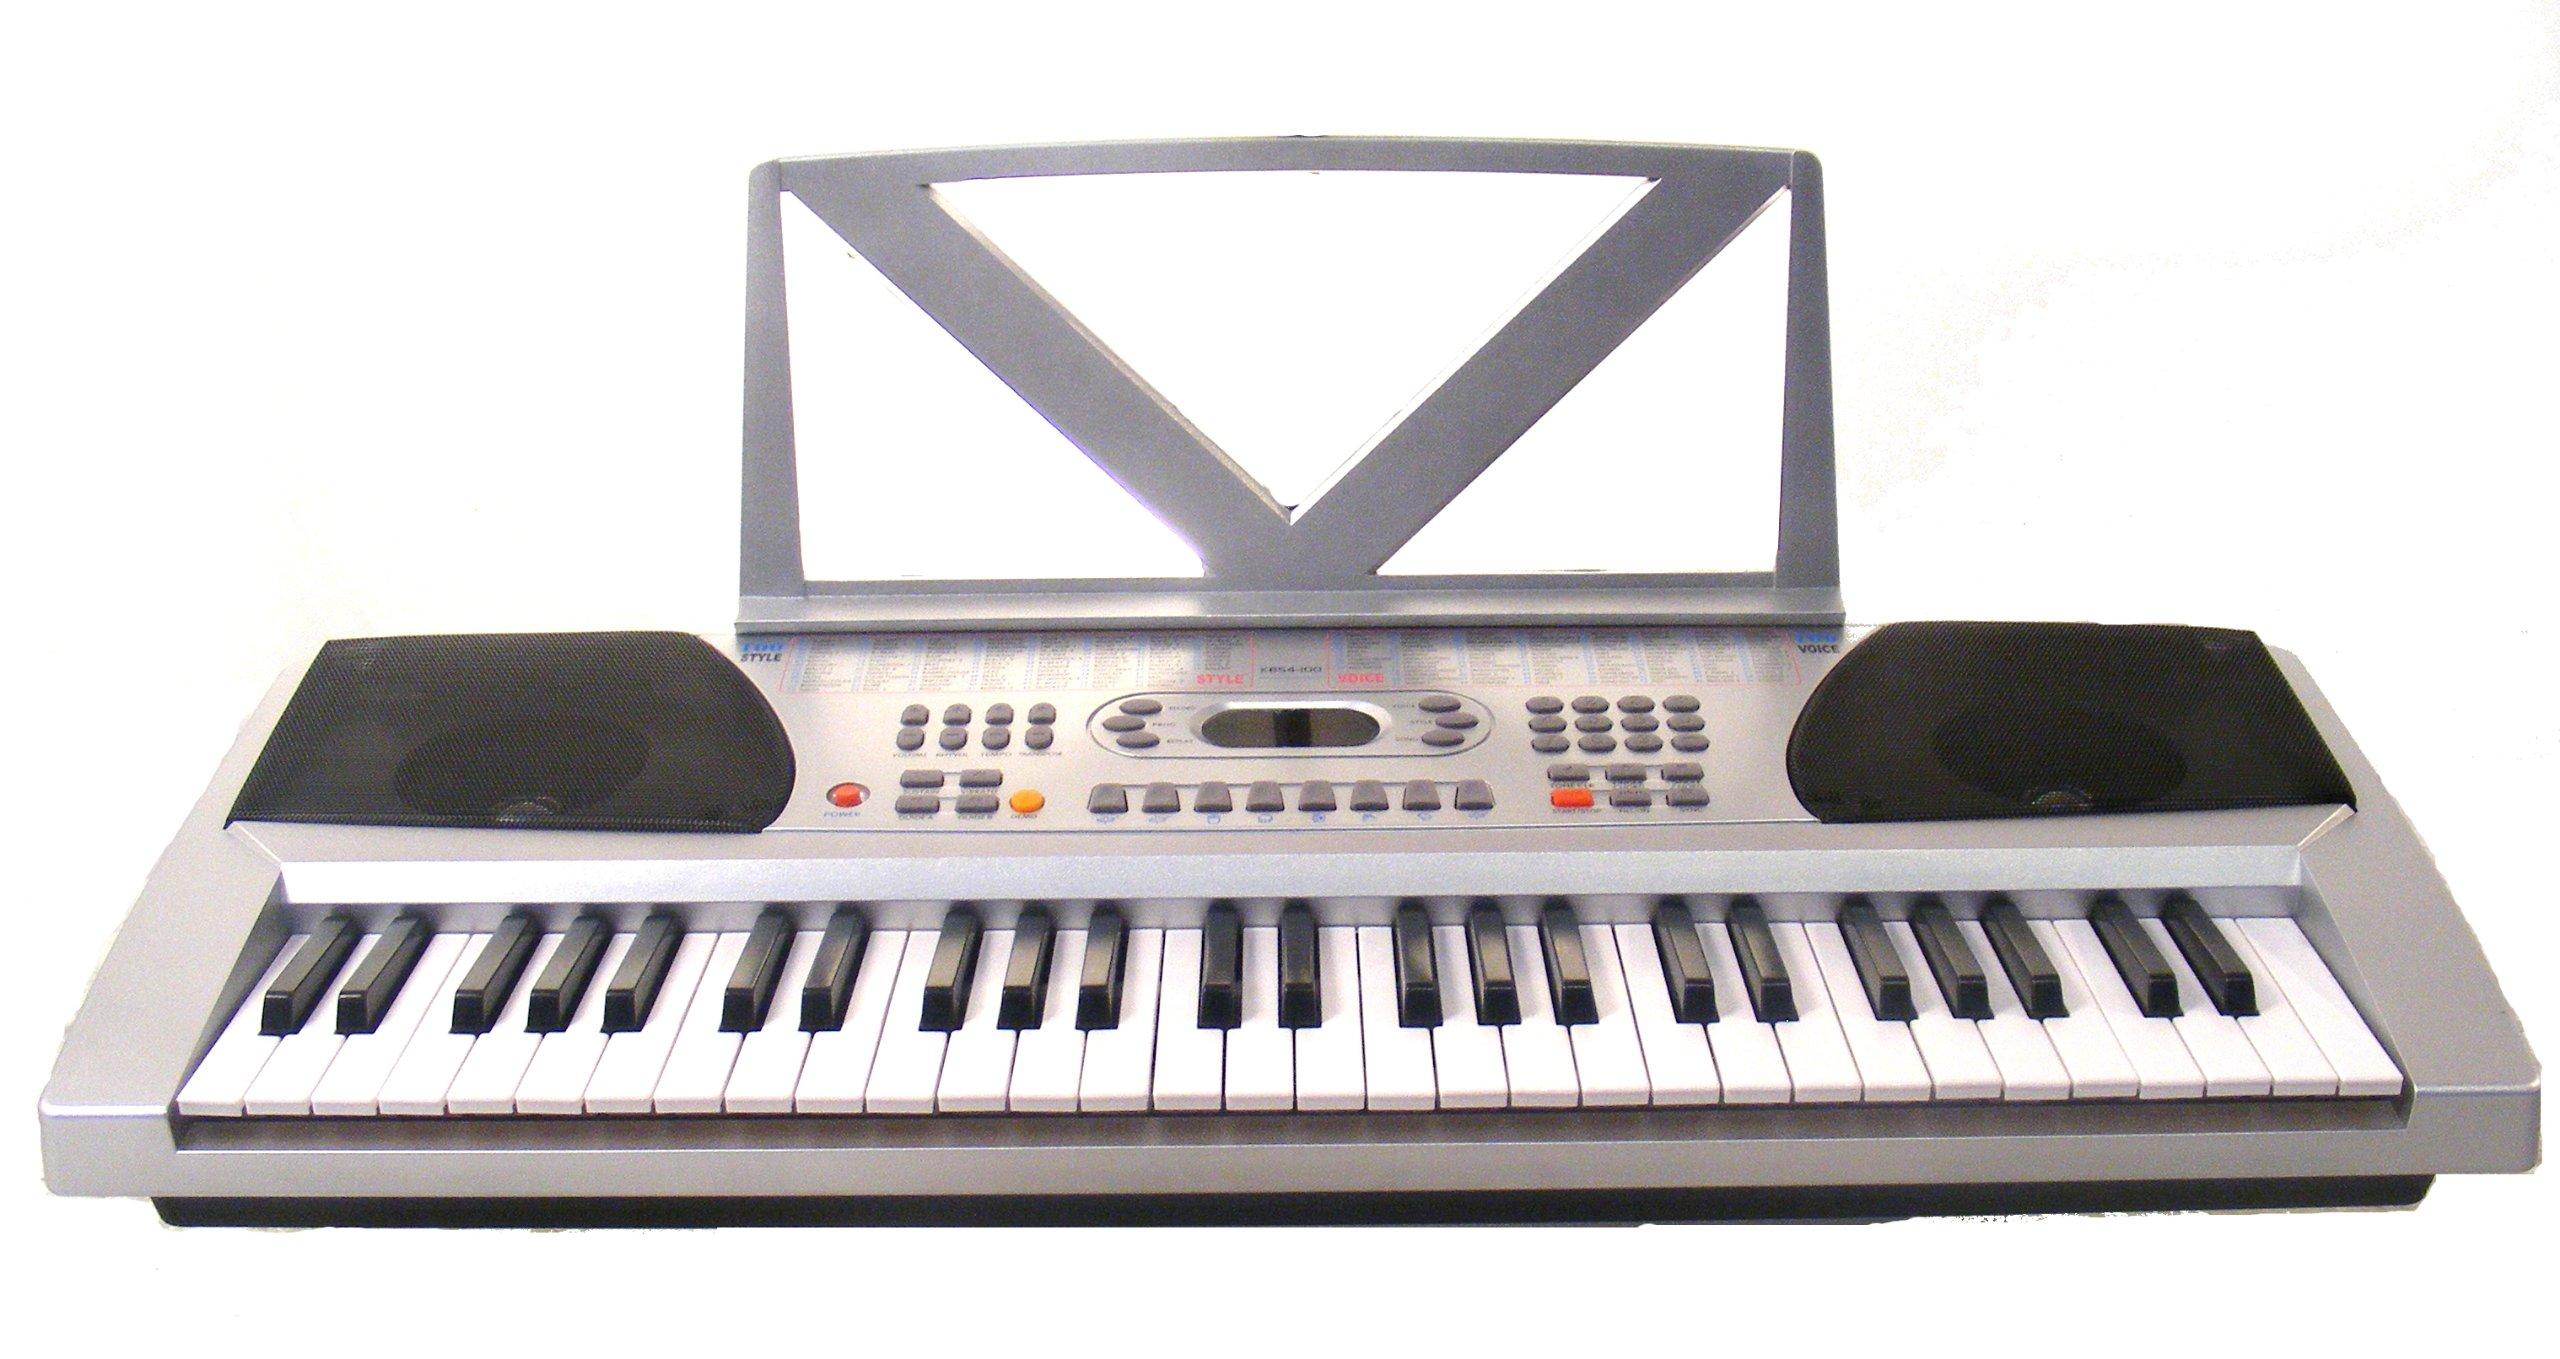 Huntington KB54-100 54-Key Portable Electronic Keyboard (Silver) by Huntington